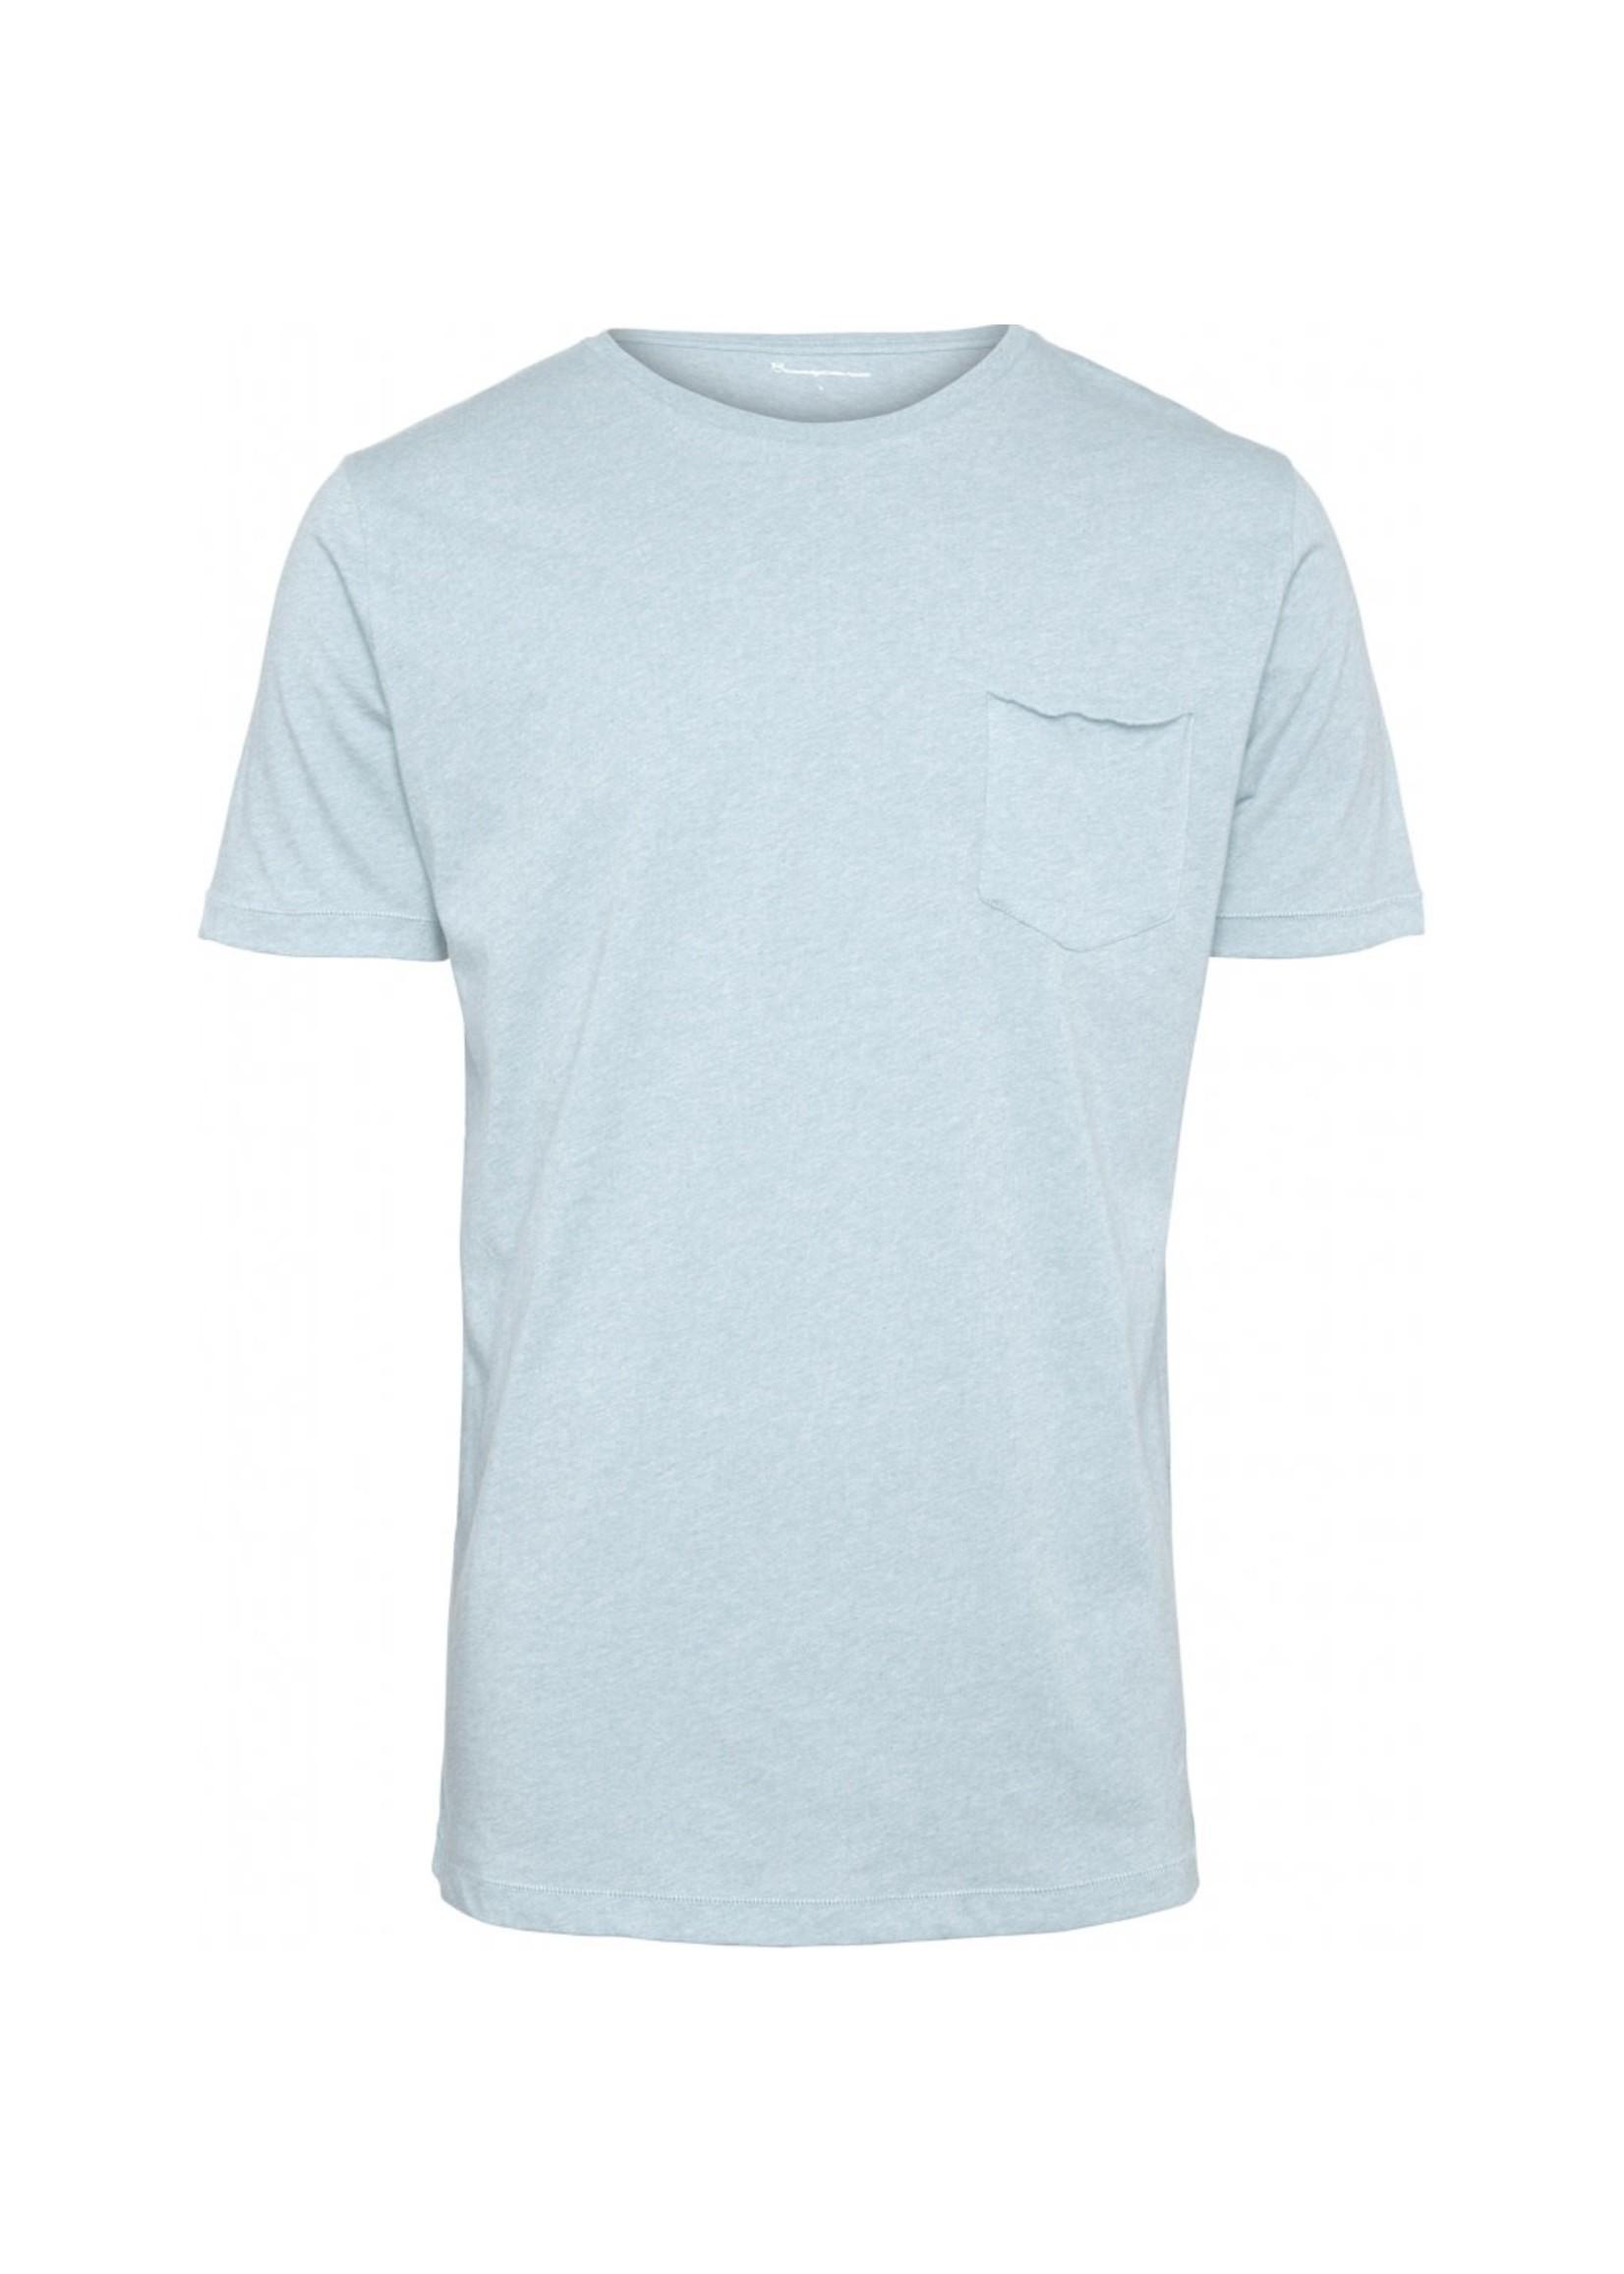 KnowledgeCotton KnowledgeCotton Alder Basic T-shirt with chest pocket